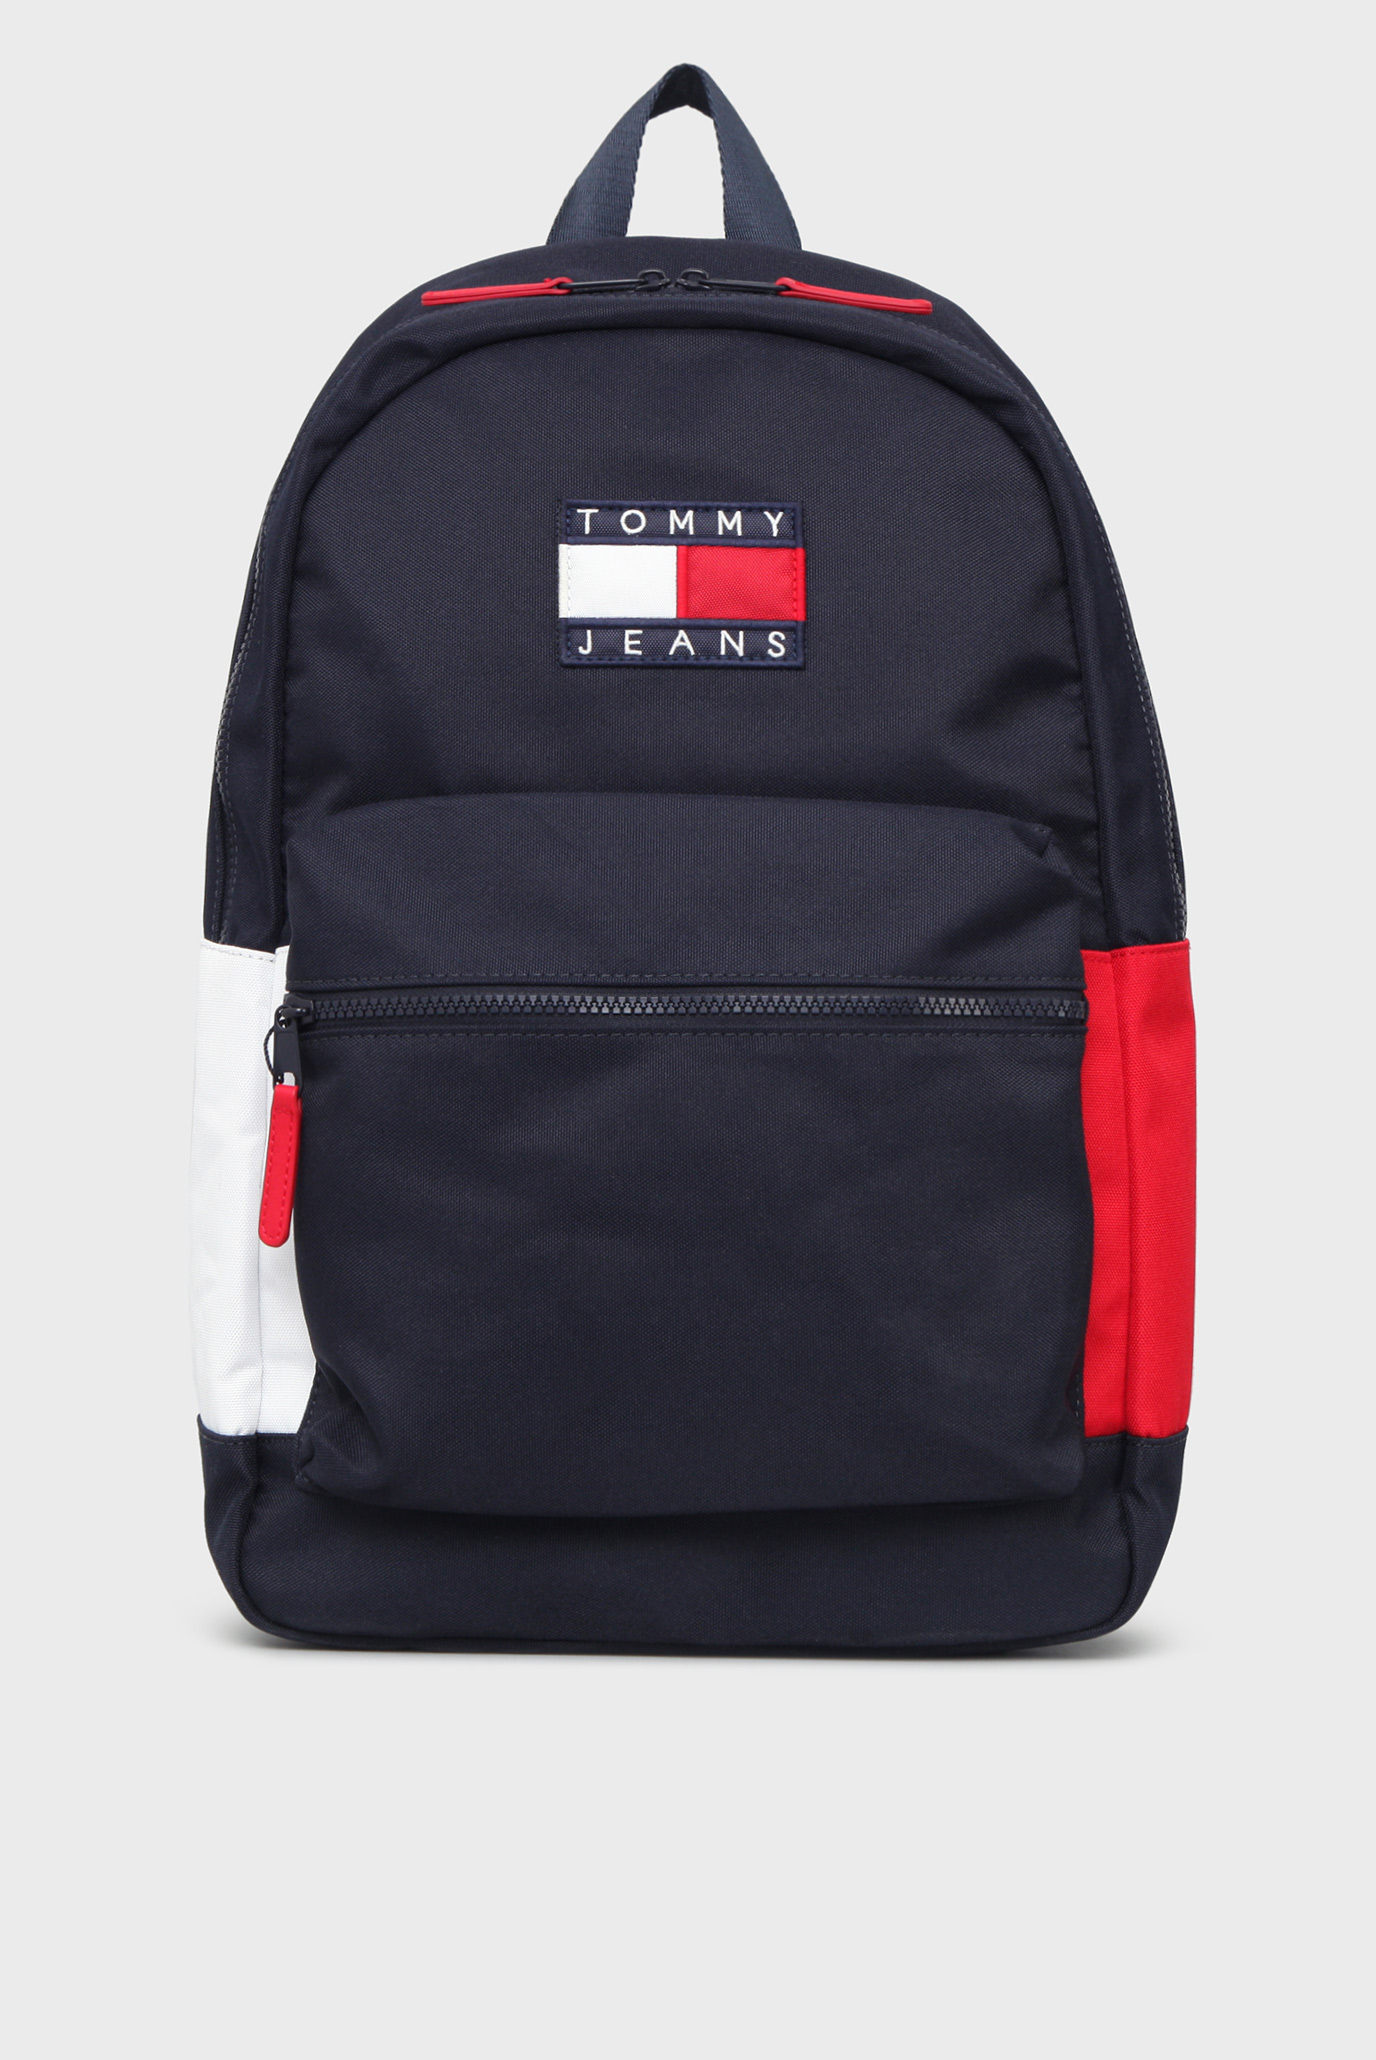 7c6e03f19129 Купить Мужской синий рюкзак Tommy Hilfiger Tommy Hilfiger AM0AM02878 –  Киев, Украина. Цены в интернет магазине MD Fashion